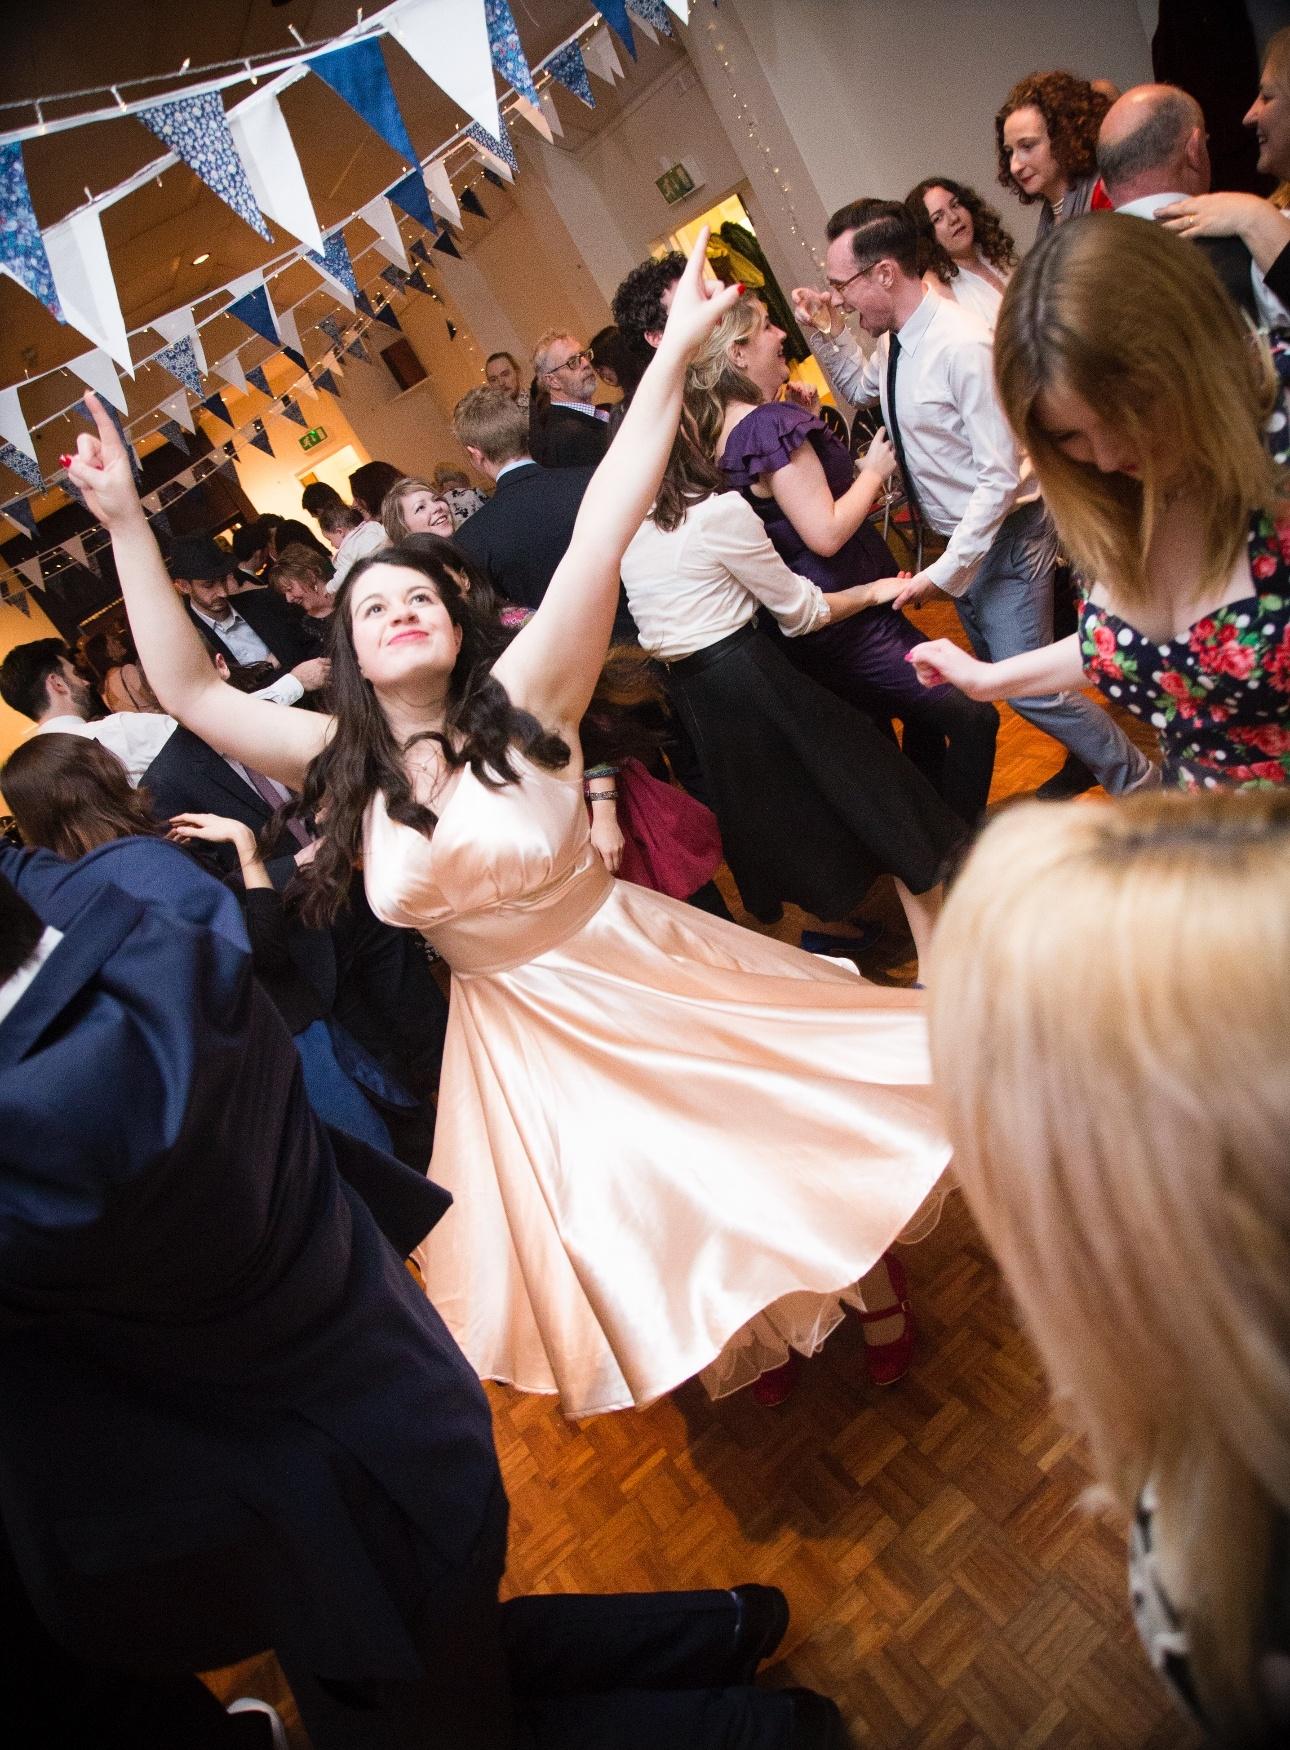 Bride in retro wedding dress dancing with her guests